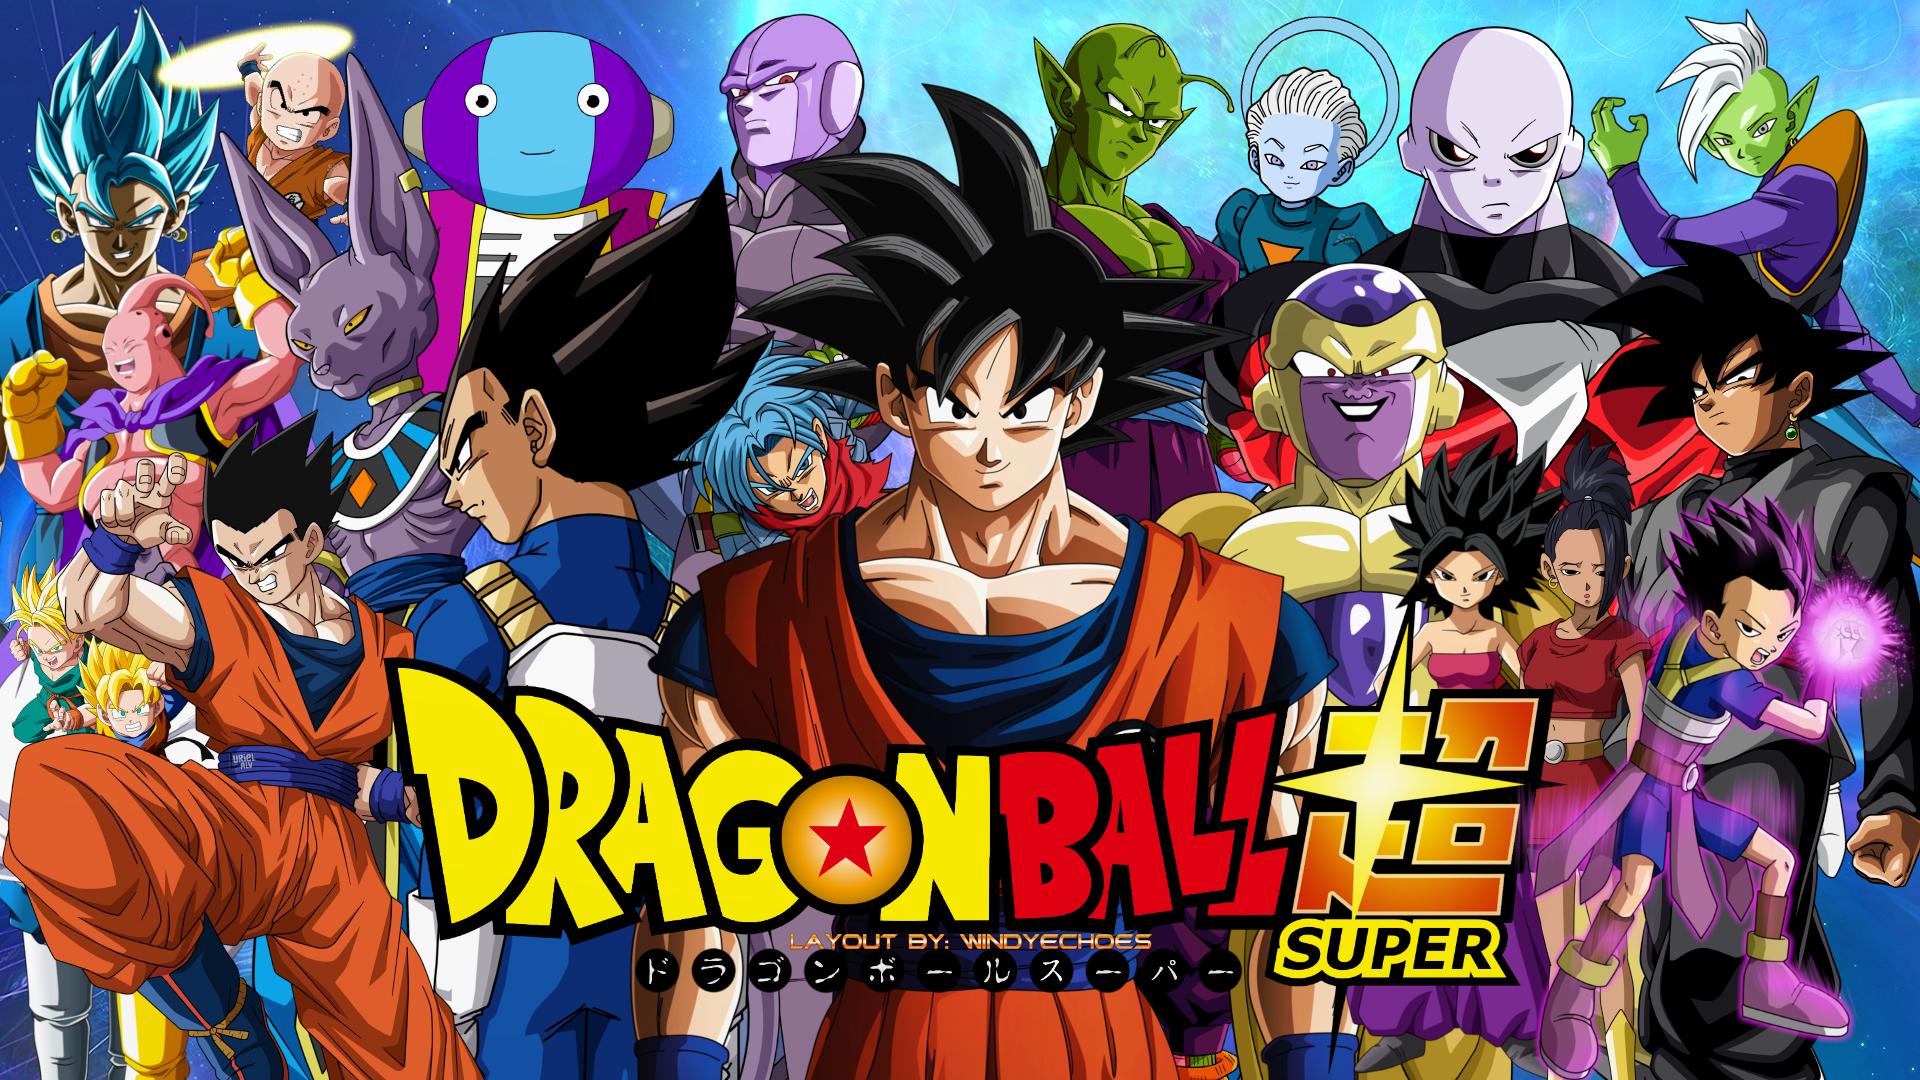 Dragon ball super AVANCE 120 HD sub espa±ol Anime